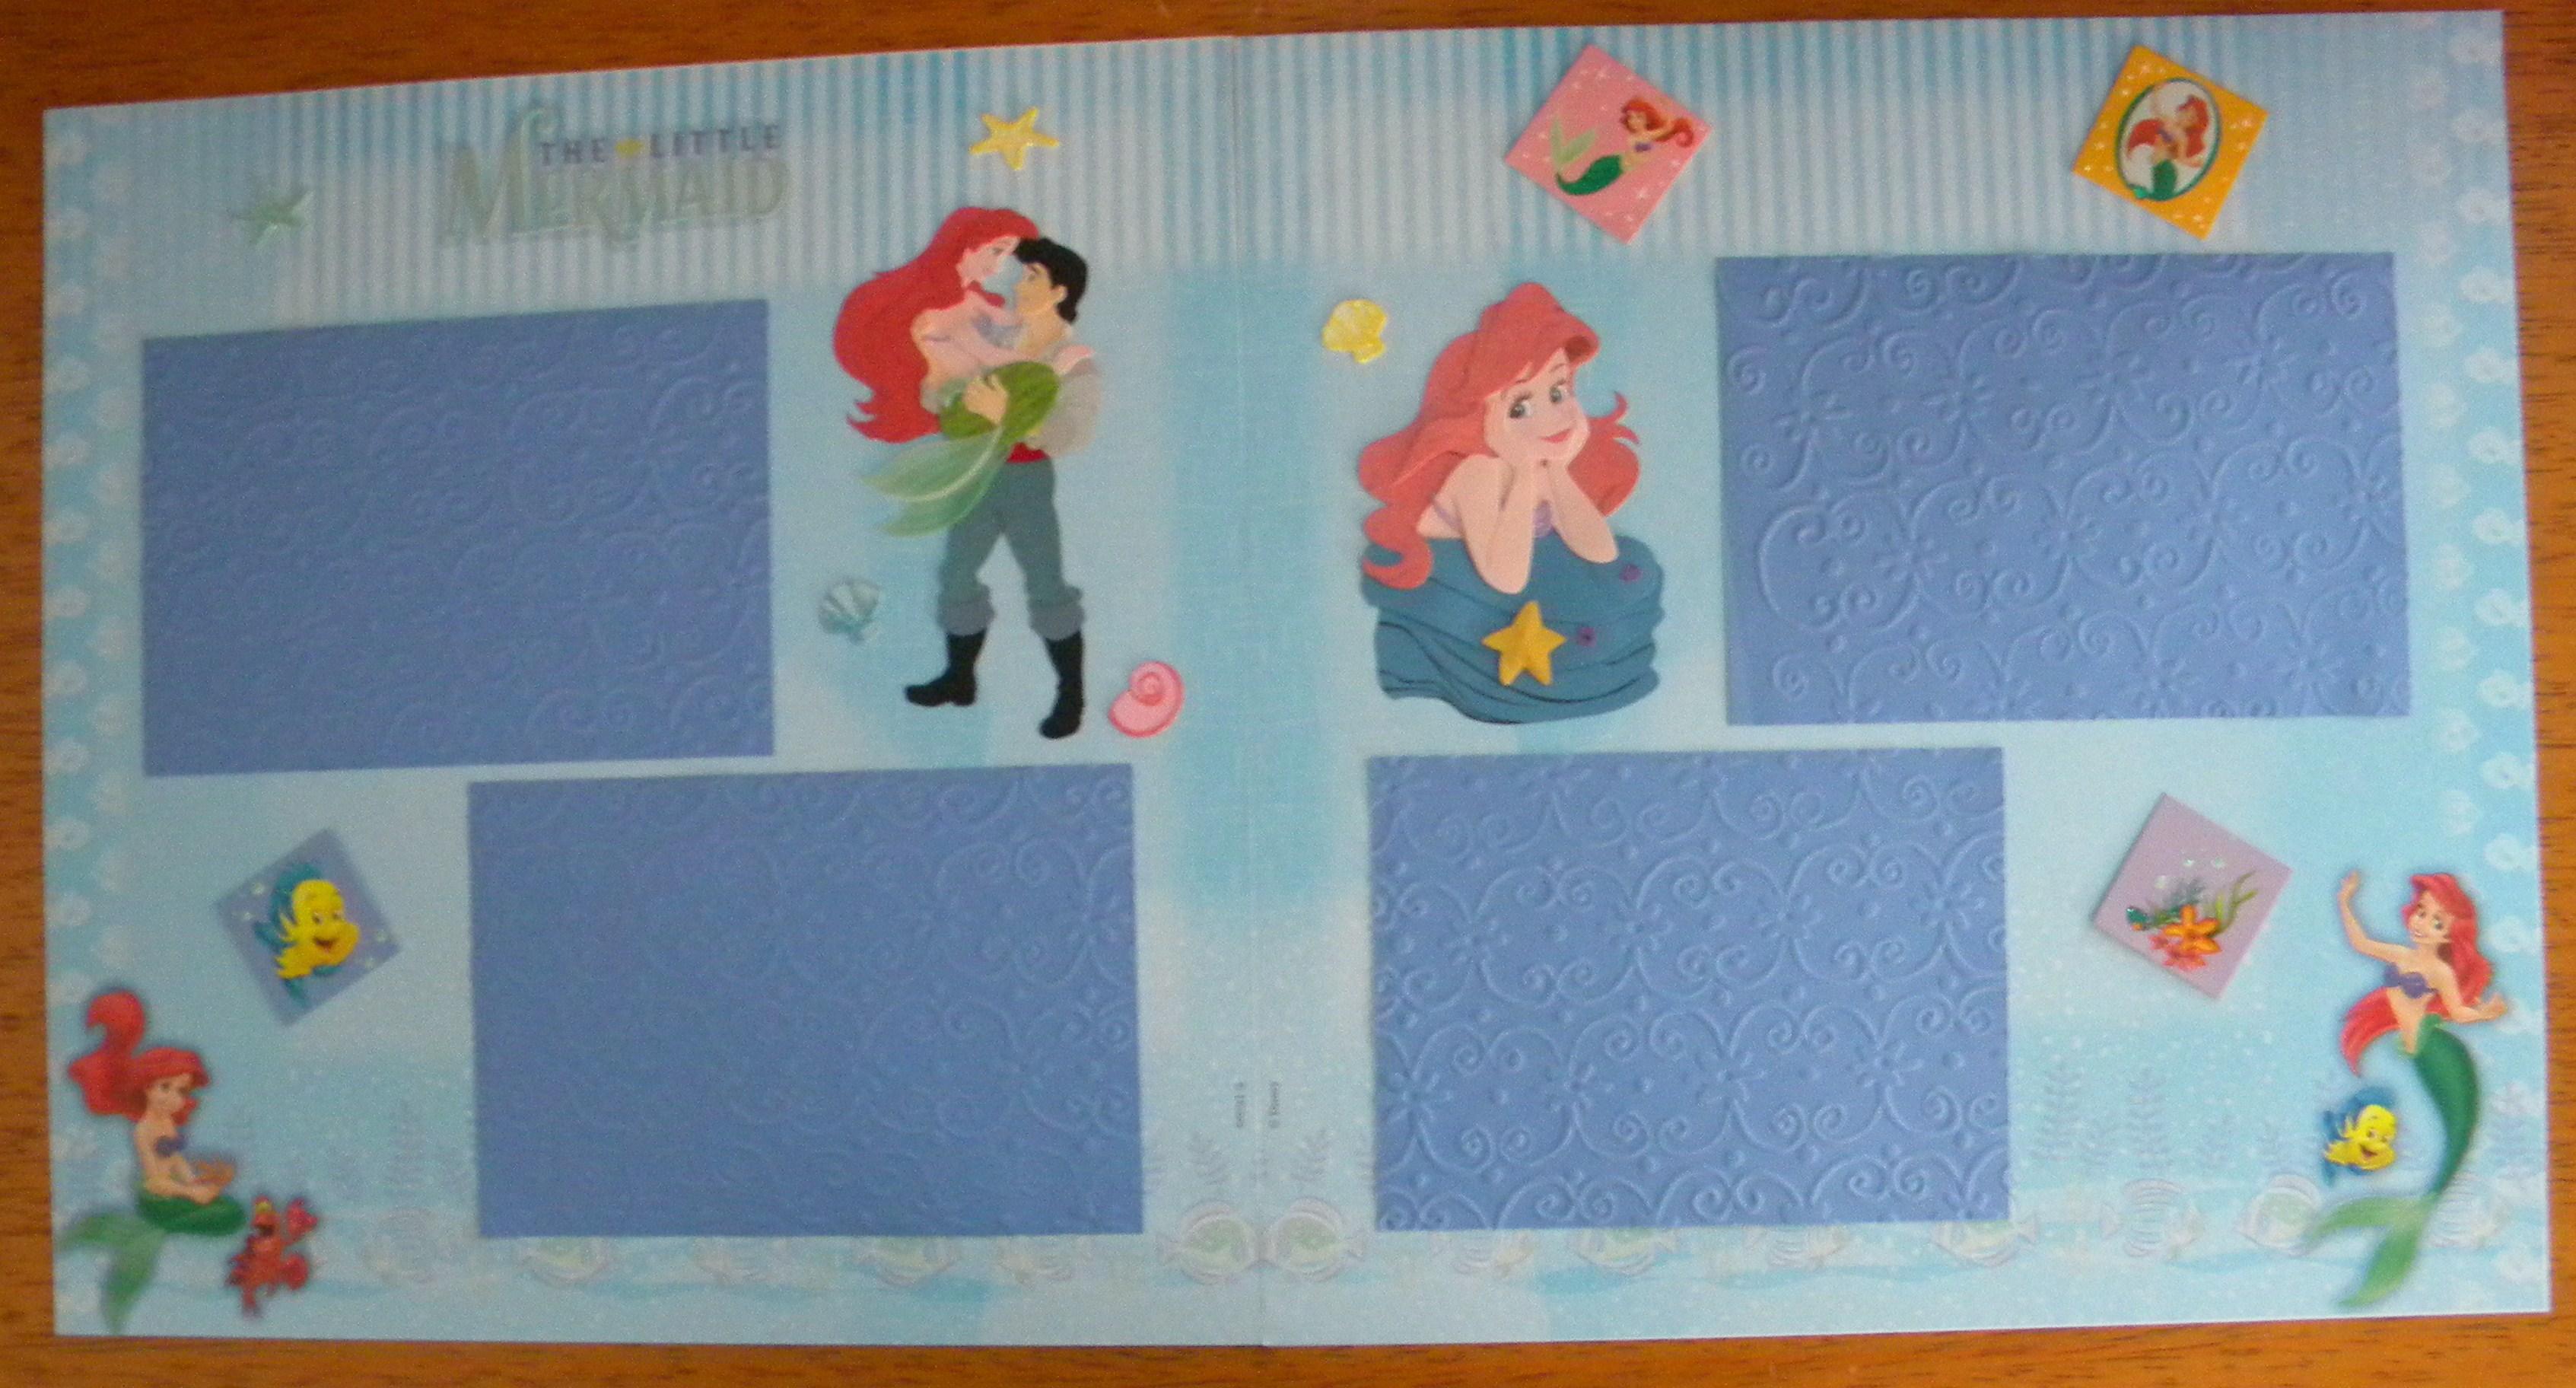 Disney scrapbook ideas - Disney Princess Layouts